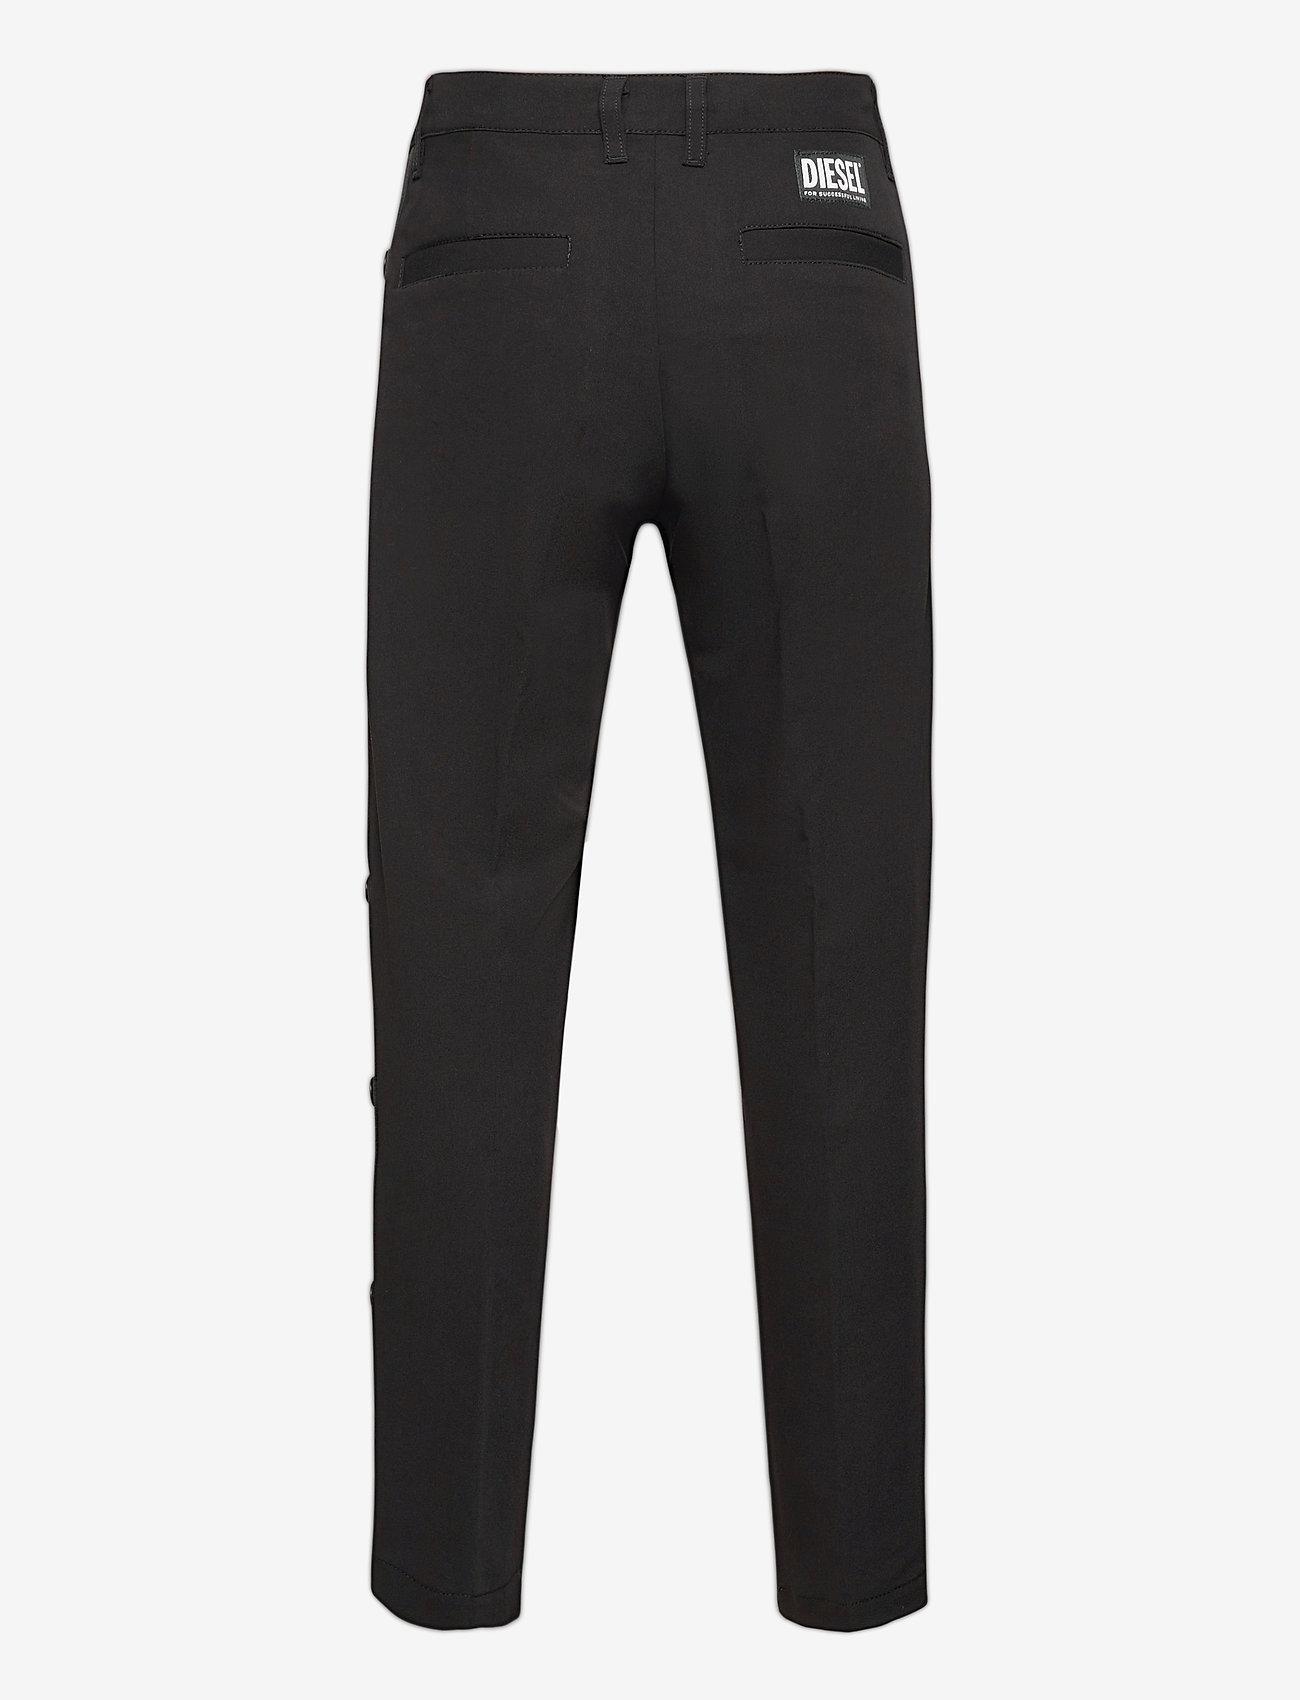 Diesel - PMARLEN TROUSERS - trousers - nero - 1